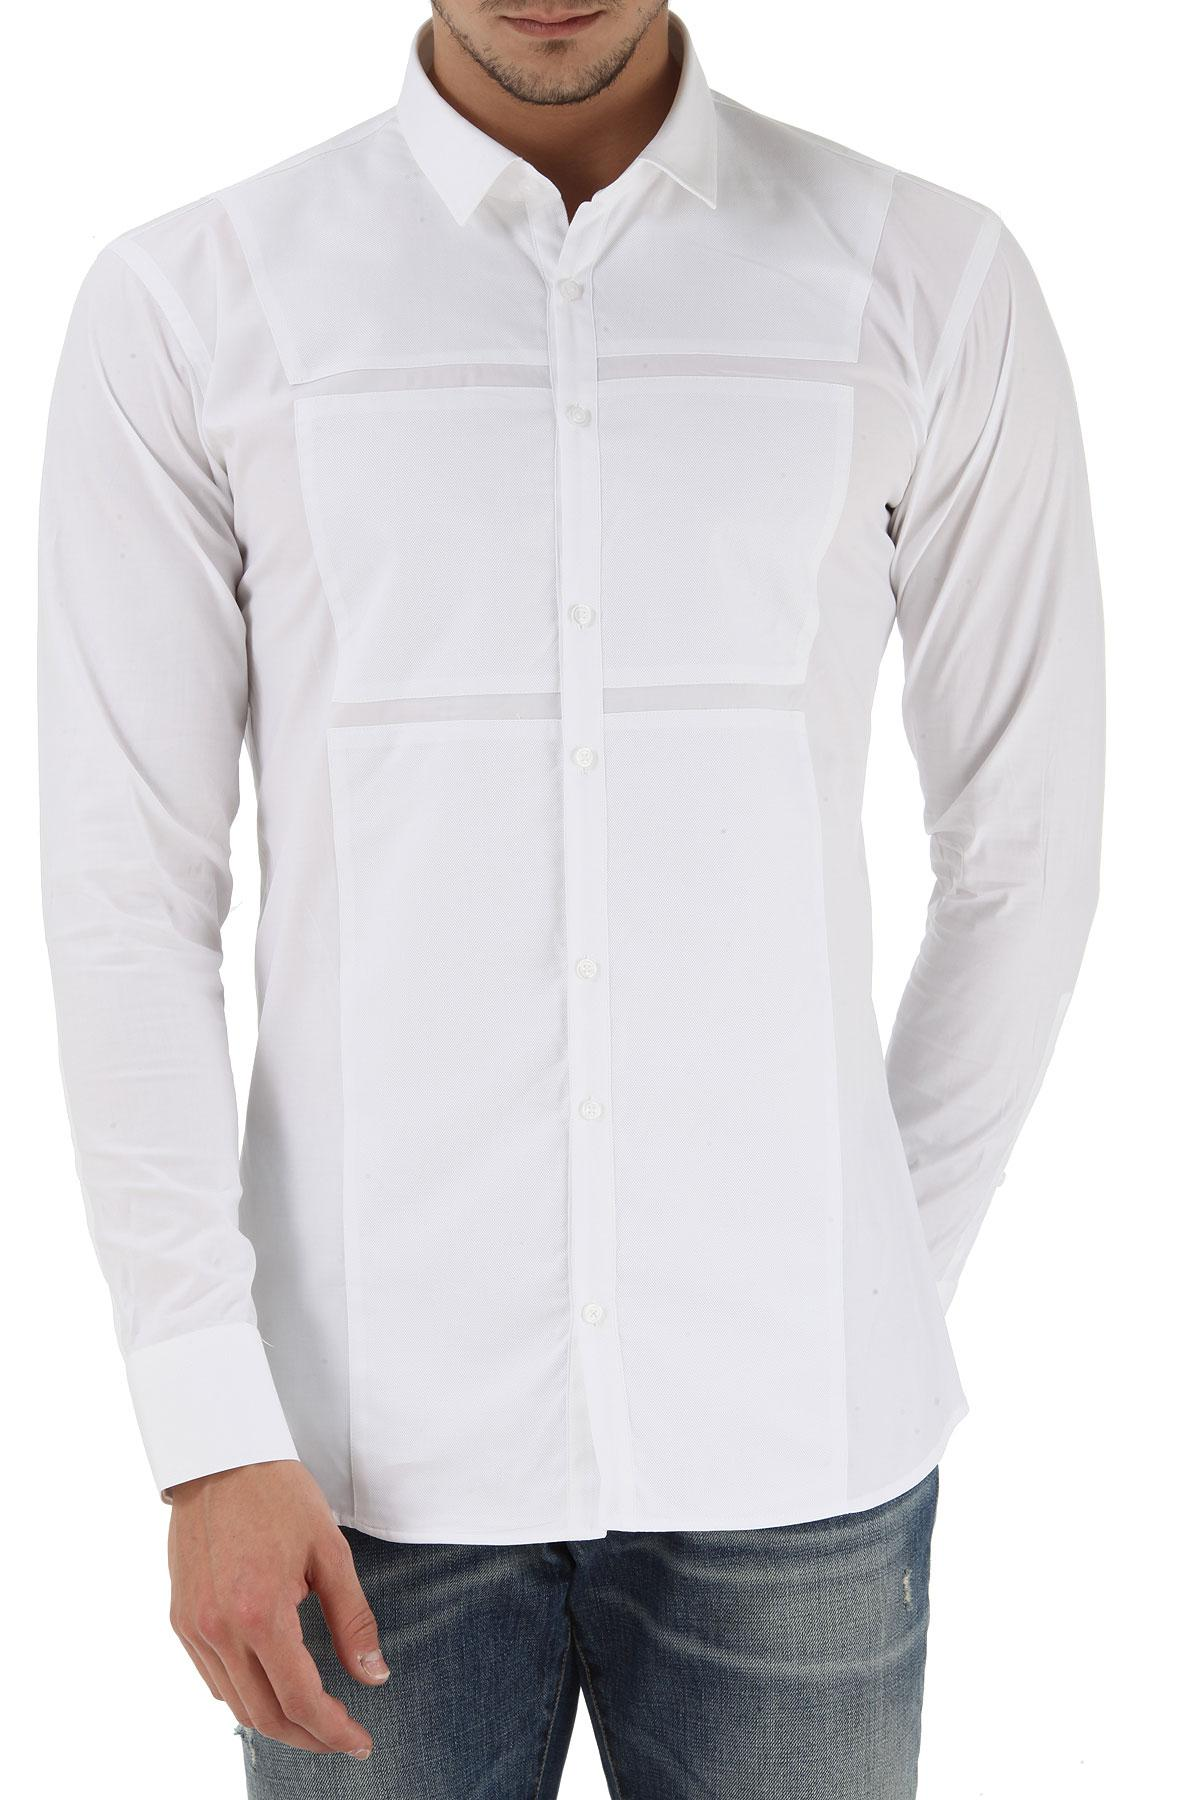 lyst karl lagerfeld clothing for men in white for men. Black Bedroom Furniture Sets. Home Design Ideas